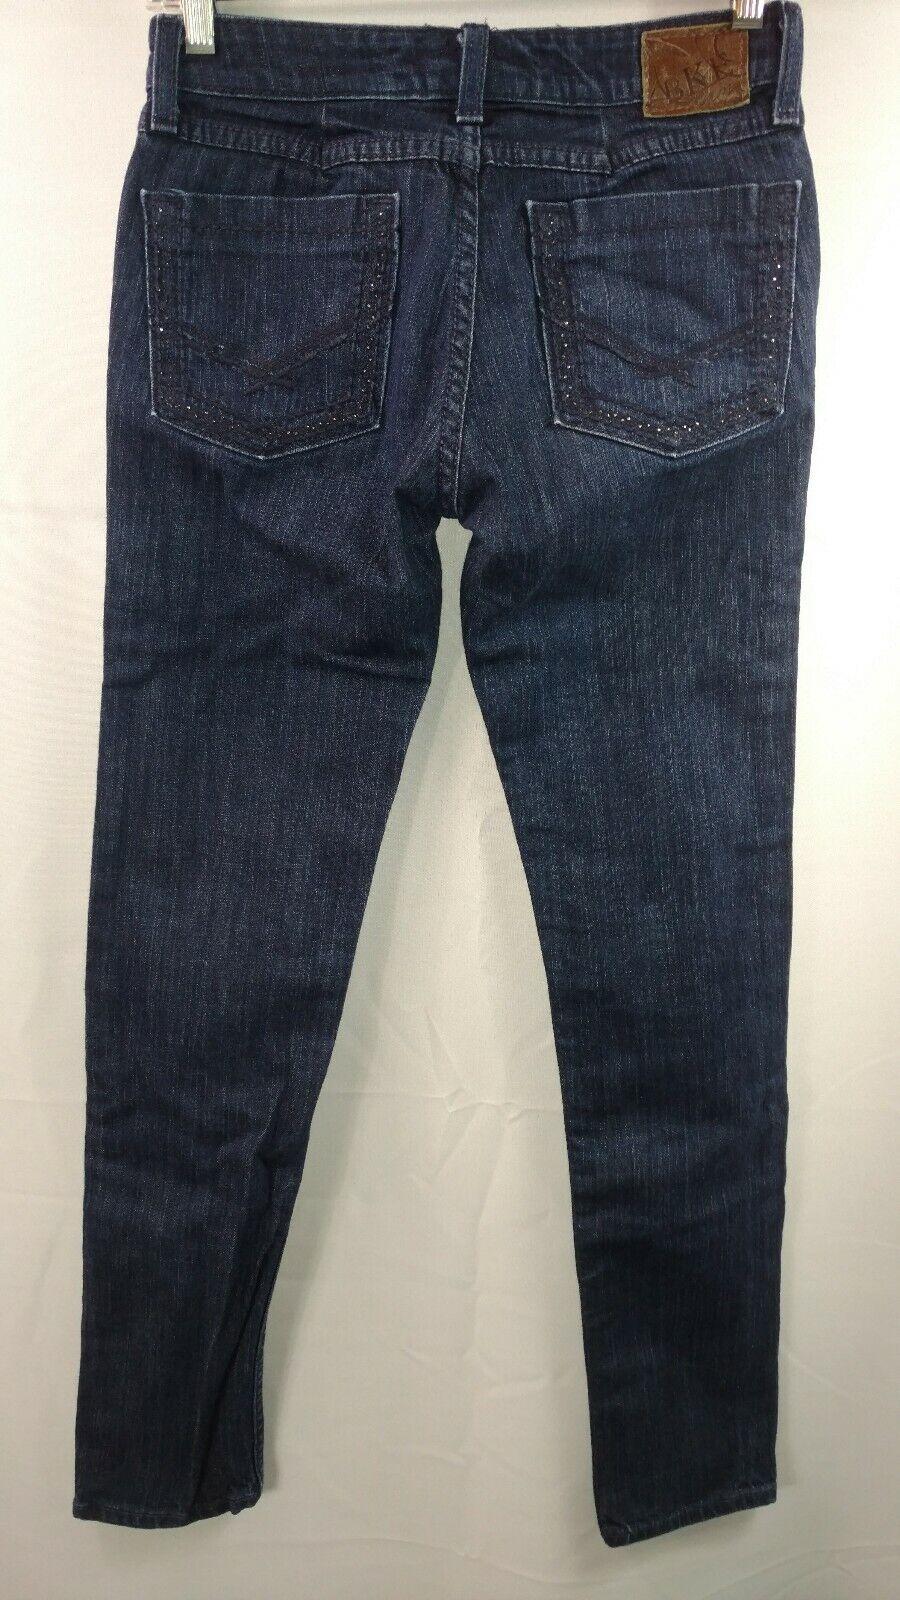 BKE Brooke Skinny Stretch Women's 27 x31 1 2 Dark bluee Denim Jeans Casual Pants